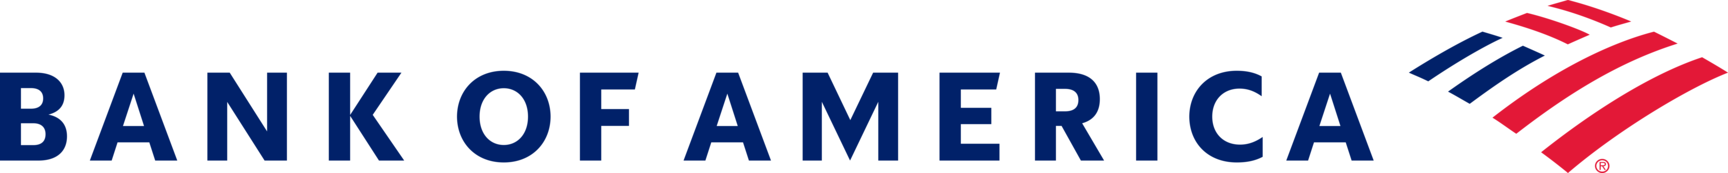 BofA enterprise horizontal color logo